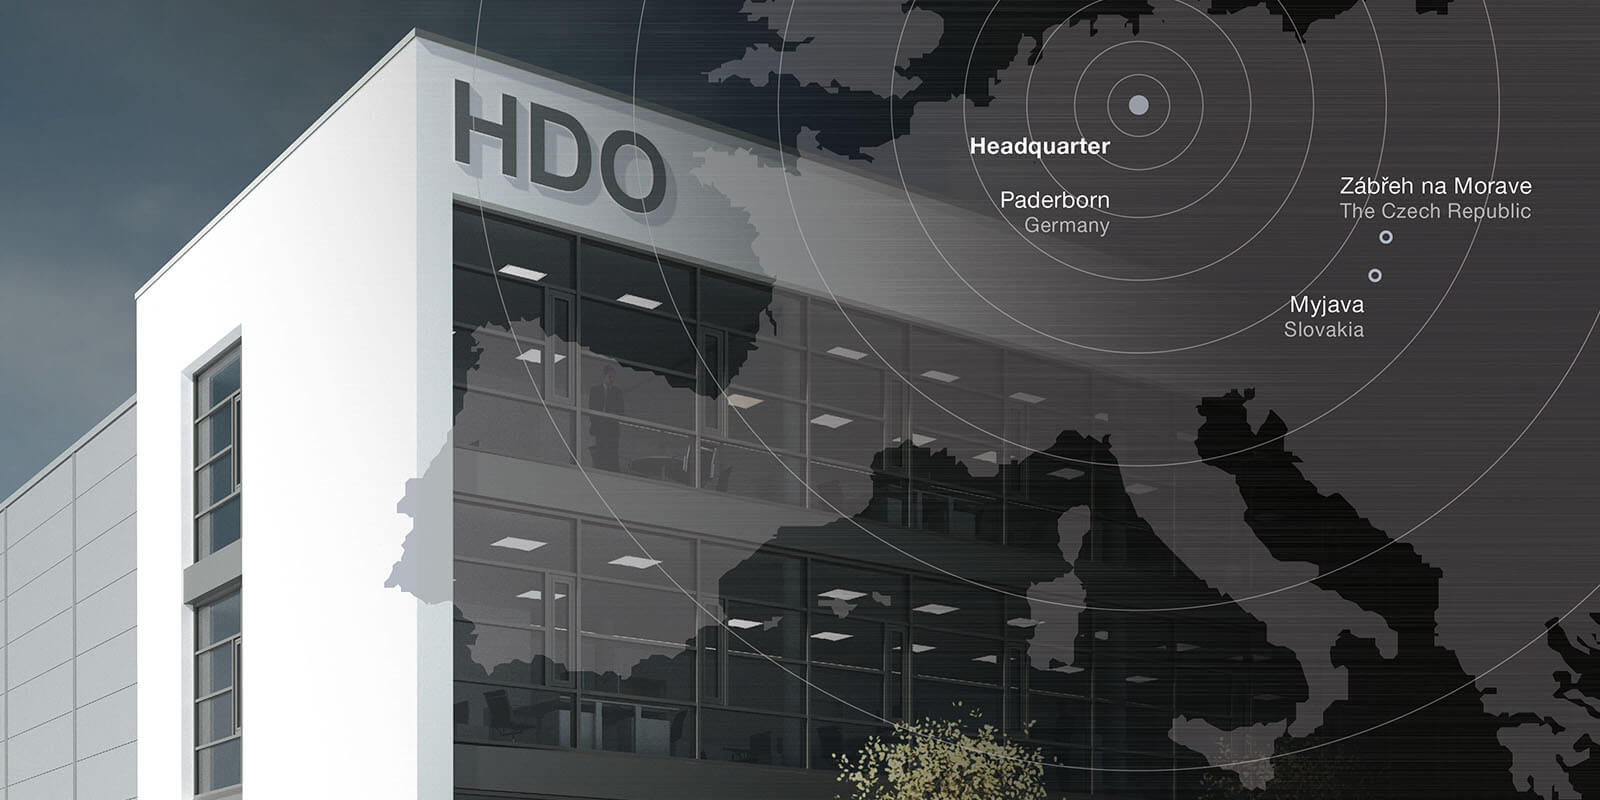 https://hdo-gmbh.com/wp-content/uploads/HDO_images_1600x800__0042_HDO_HDOGruppe_Standorte.jpg